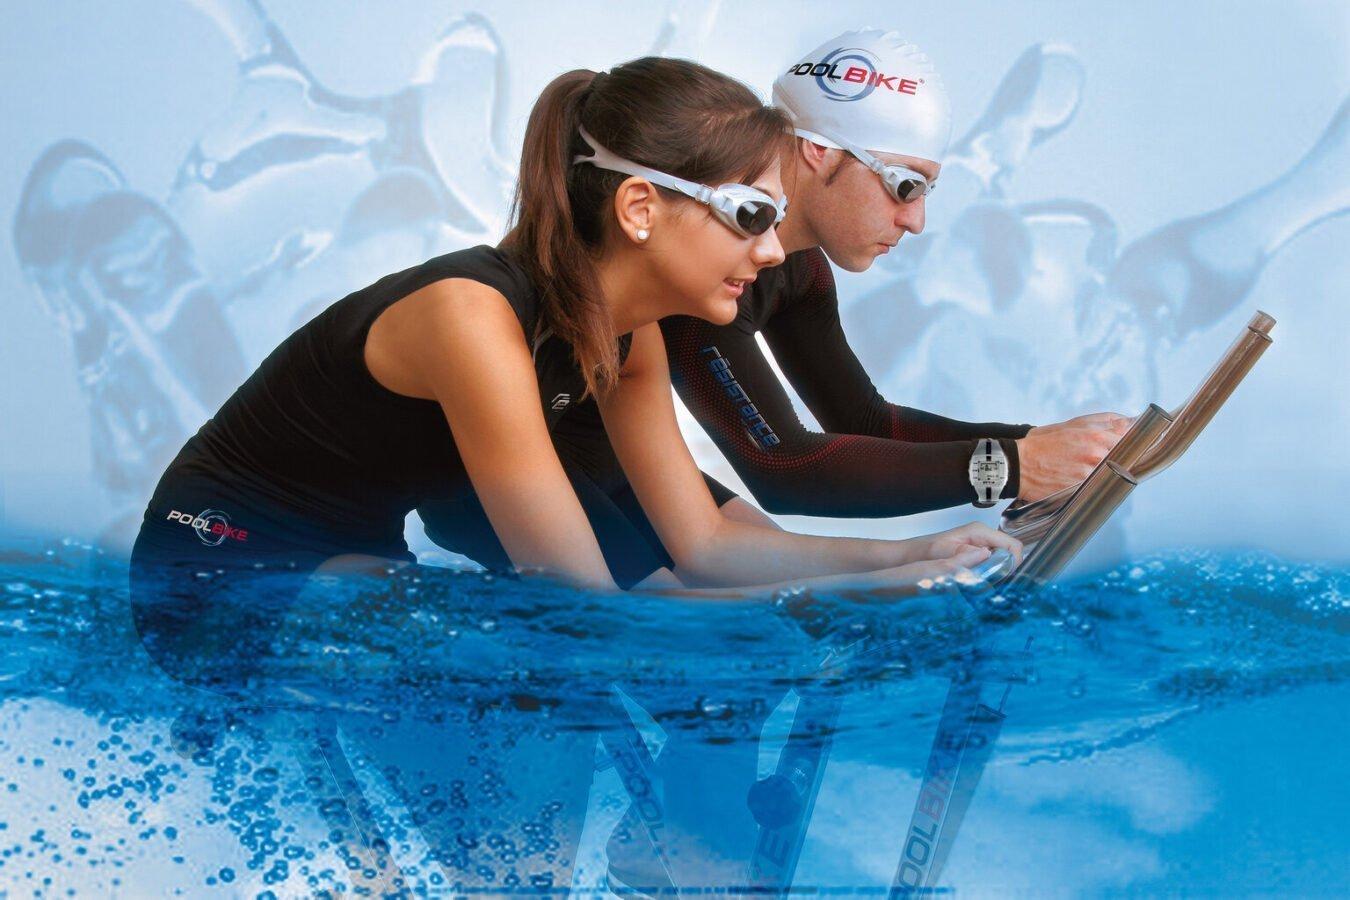 poolbiking-aquabike-aquaspinning2